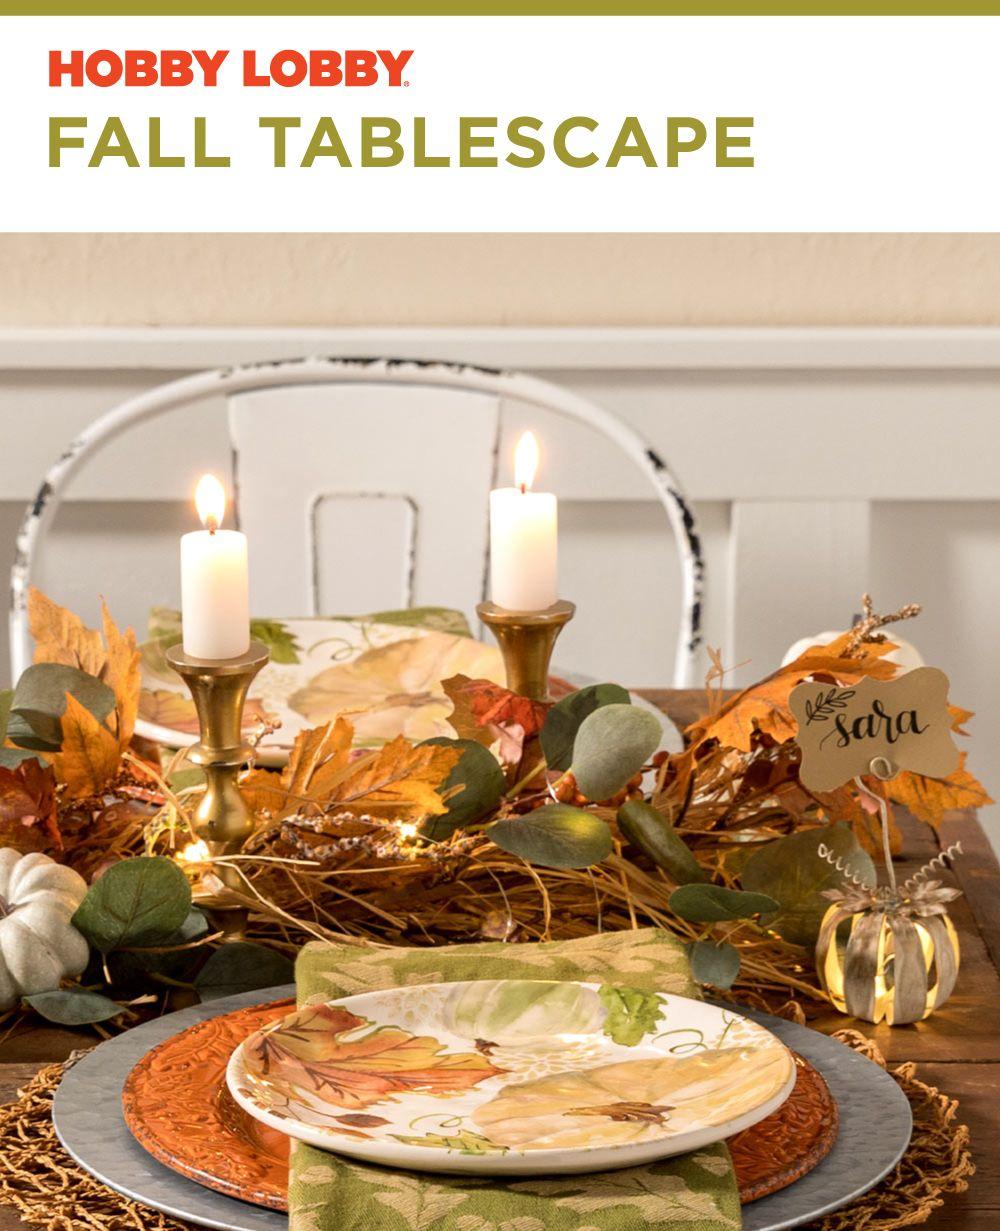 Fall Tablescape Fall Decor Hobby Lobby Fall Decor Fall Tablescapes